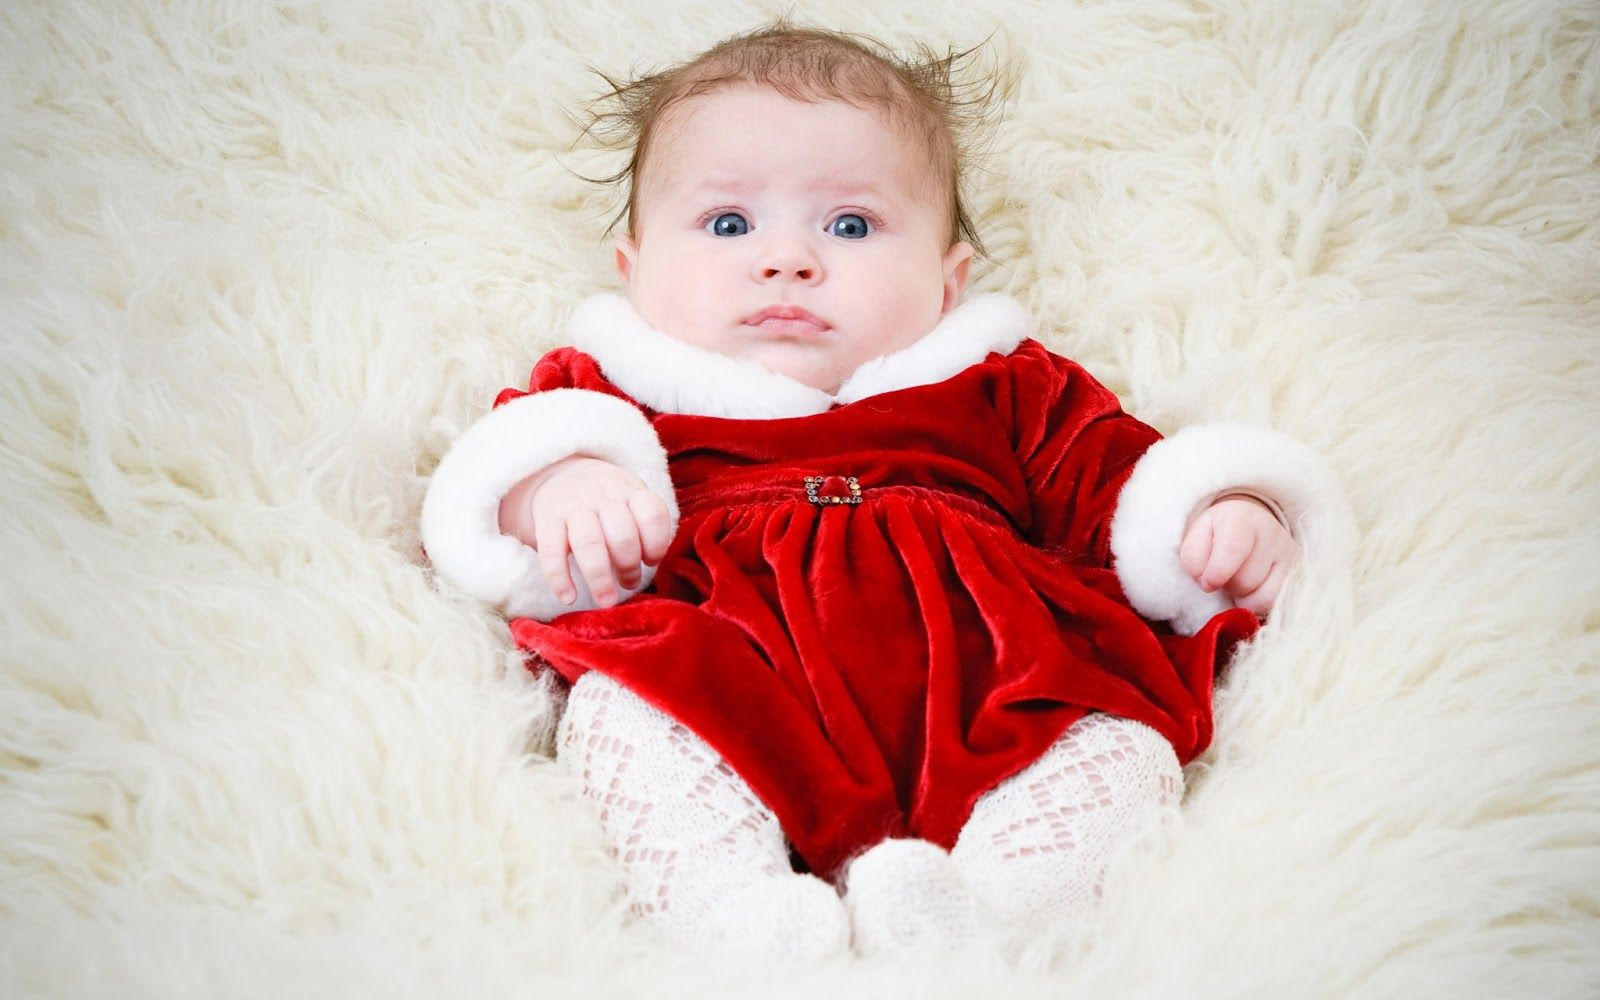 Wallpaper download baby - Cute Babies Wallpaper Download 1024 768 Wallpapers Cute Baby Download 58 Wallpapers